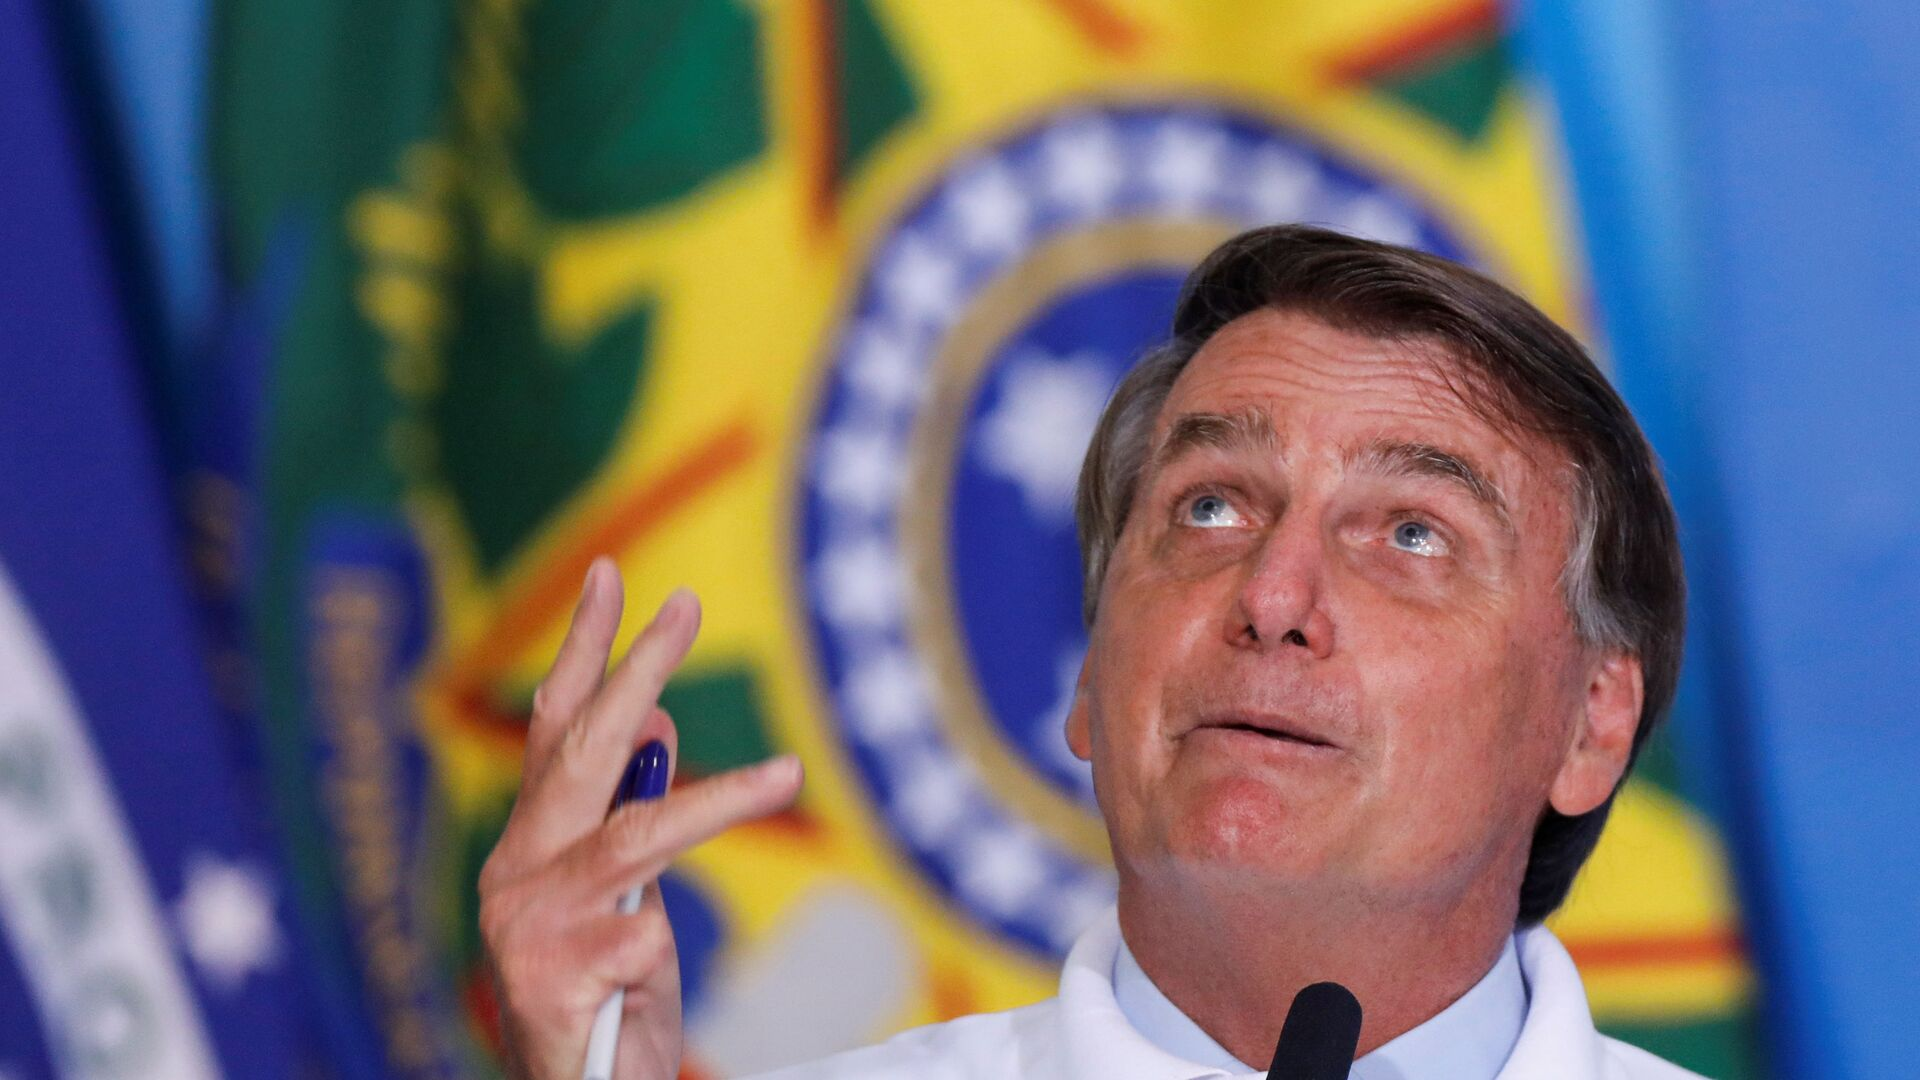 Jair Bolsonaro, presidente de Brasil - Sputnik Mundo, 1920, 01.03.2021